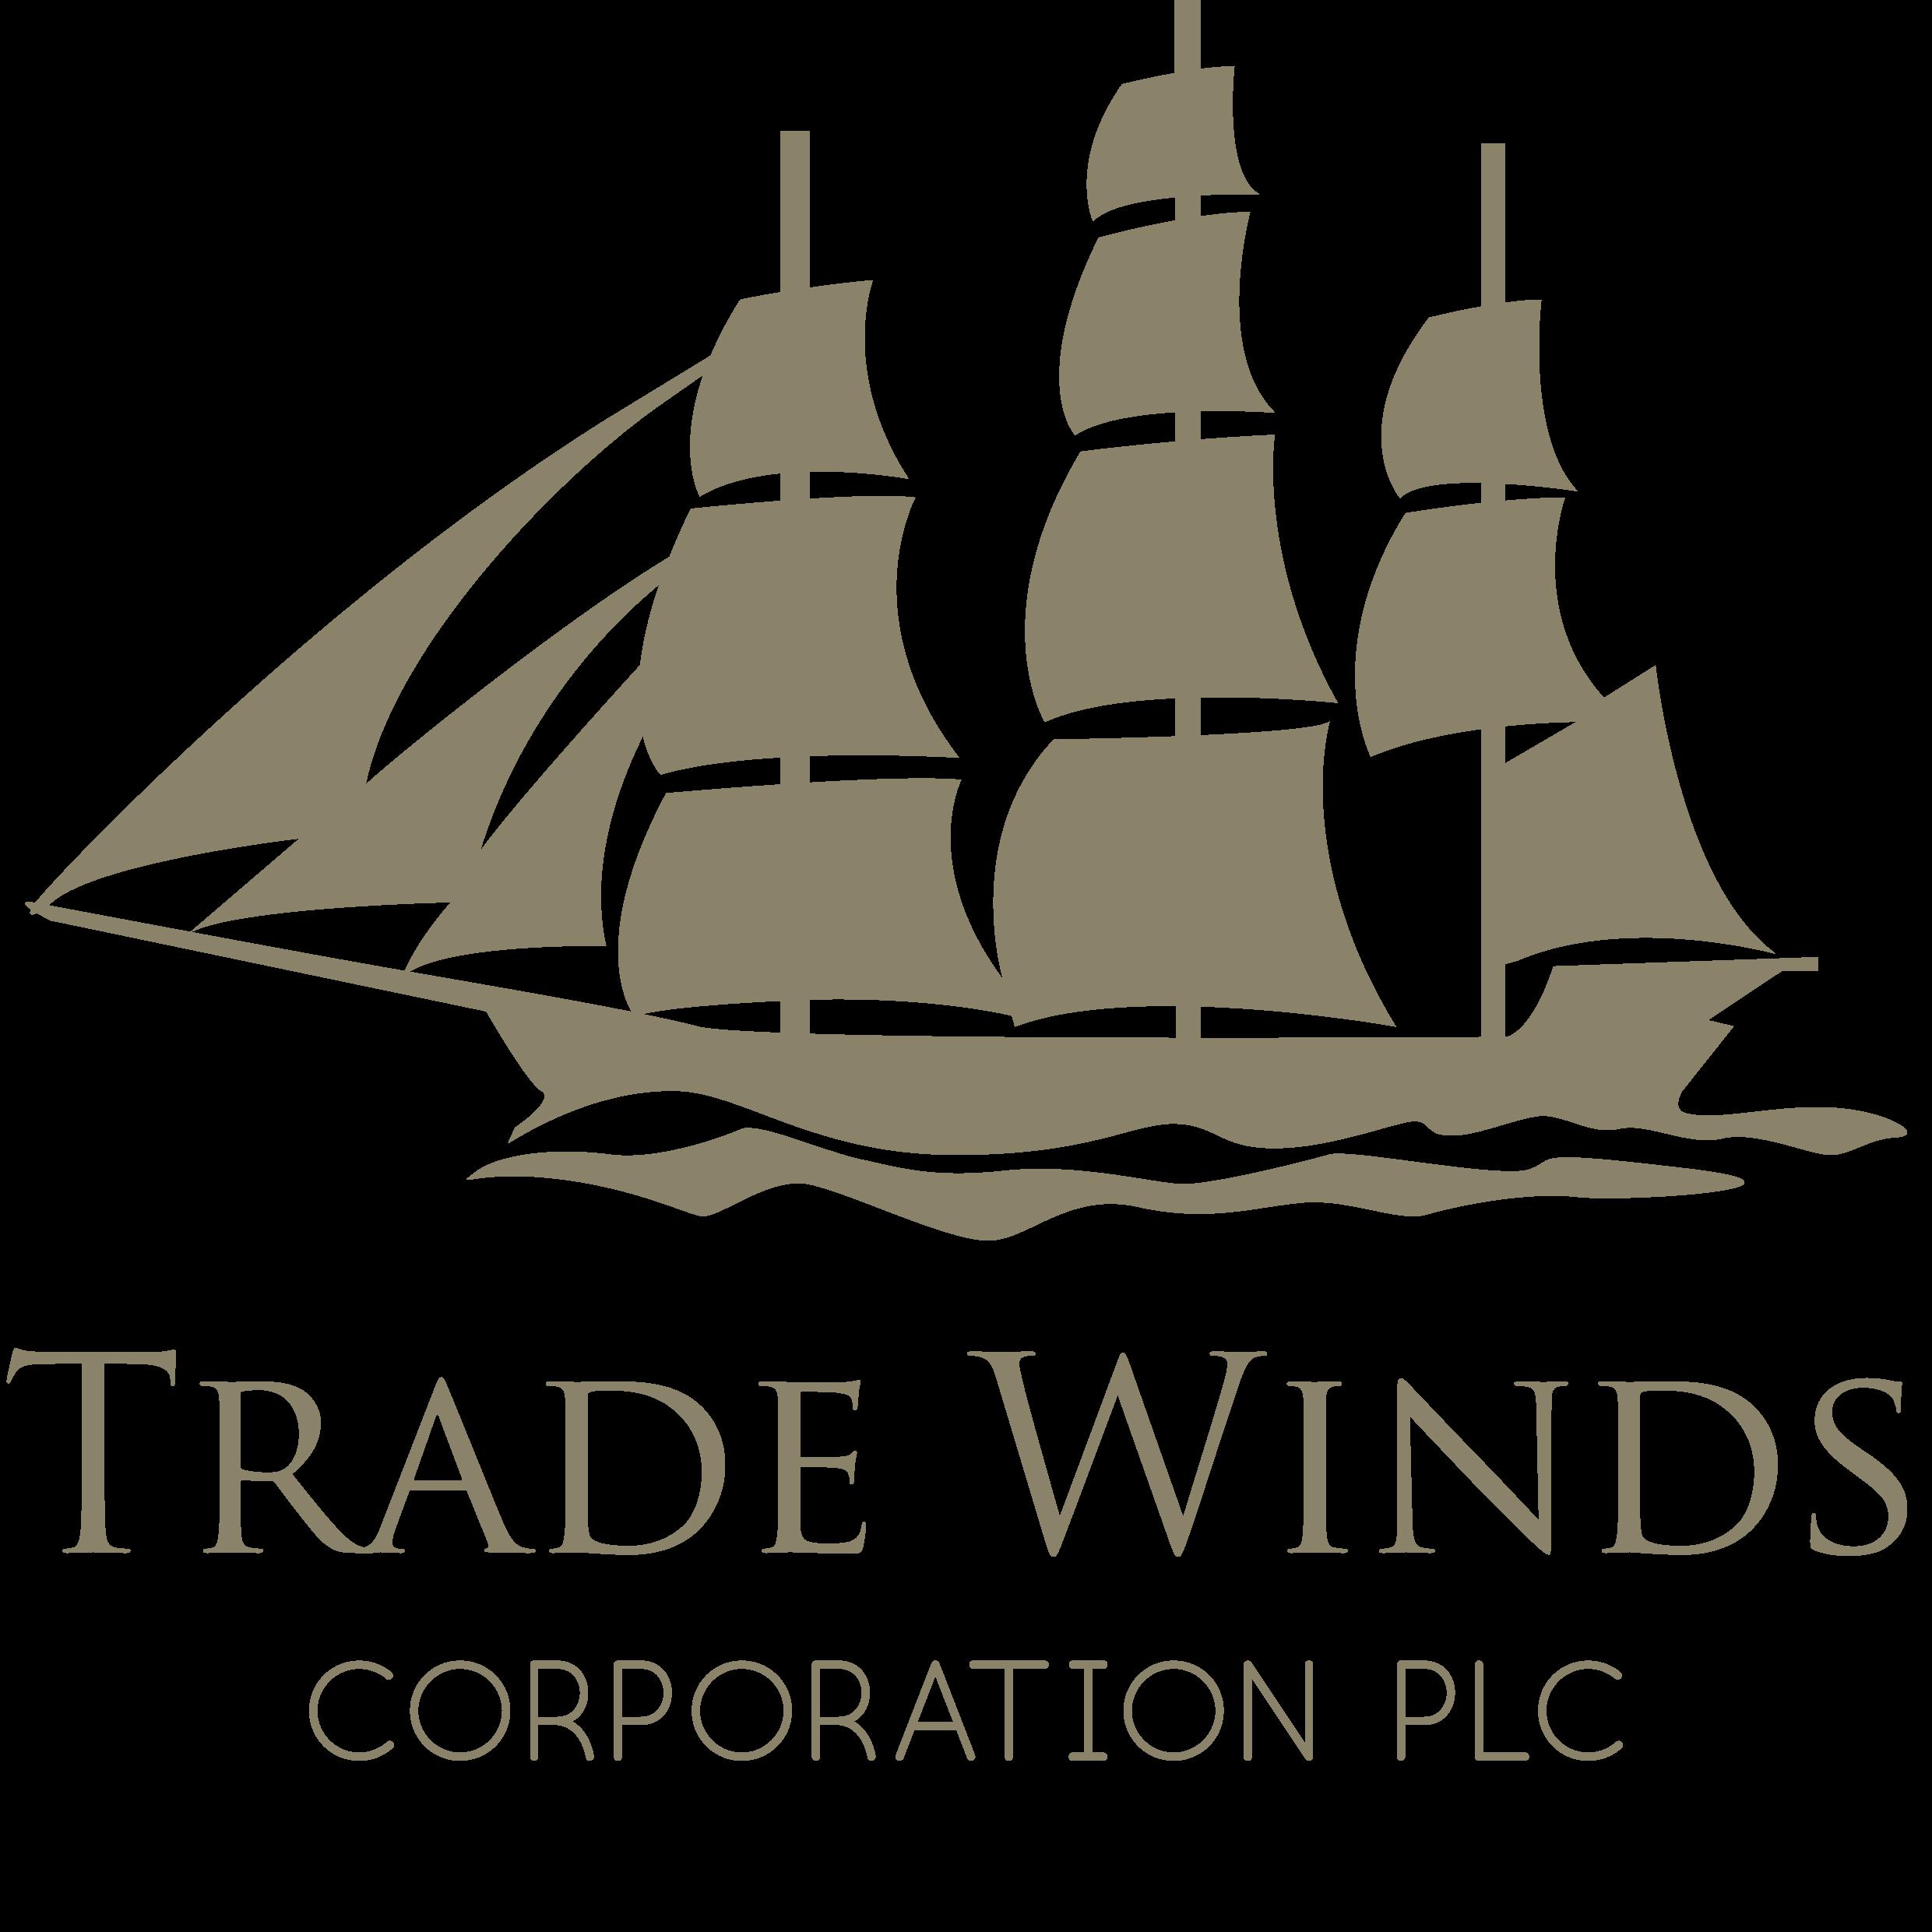 Trade Winds Corporation PLC